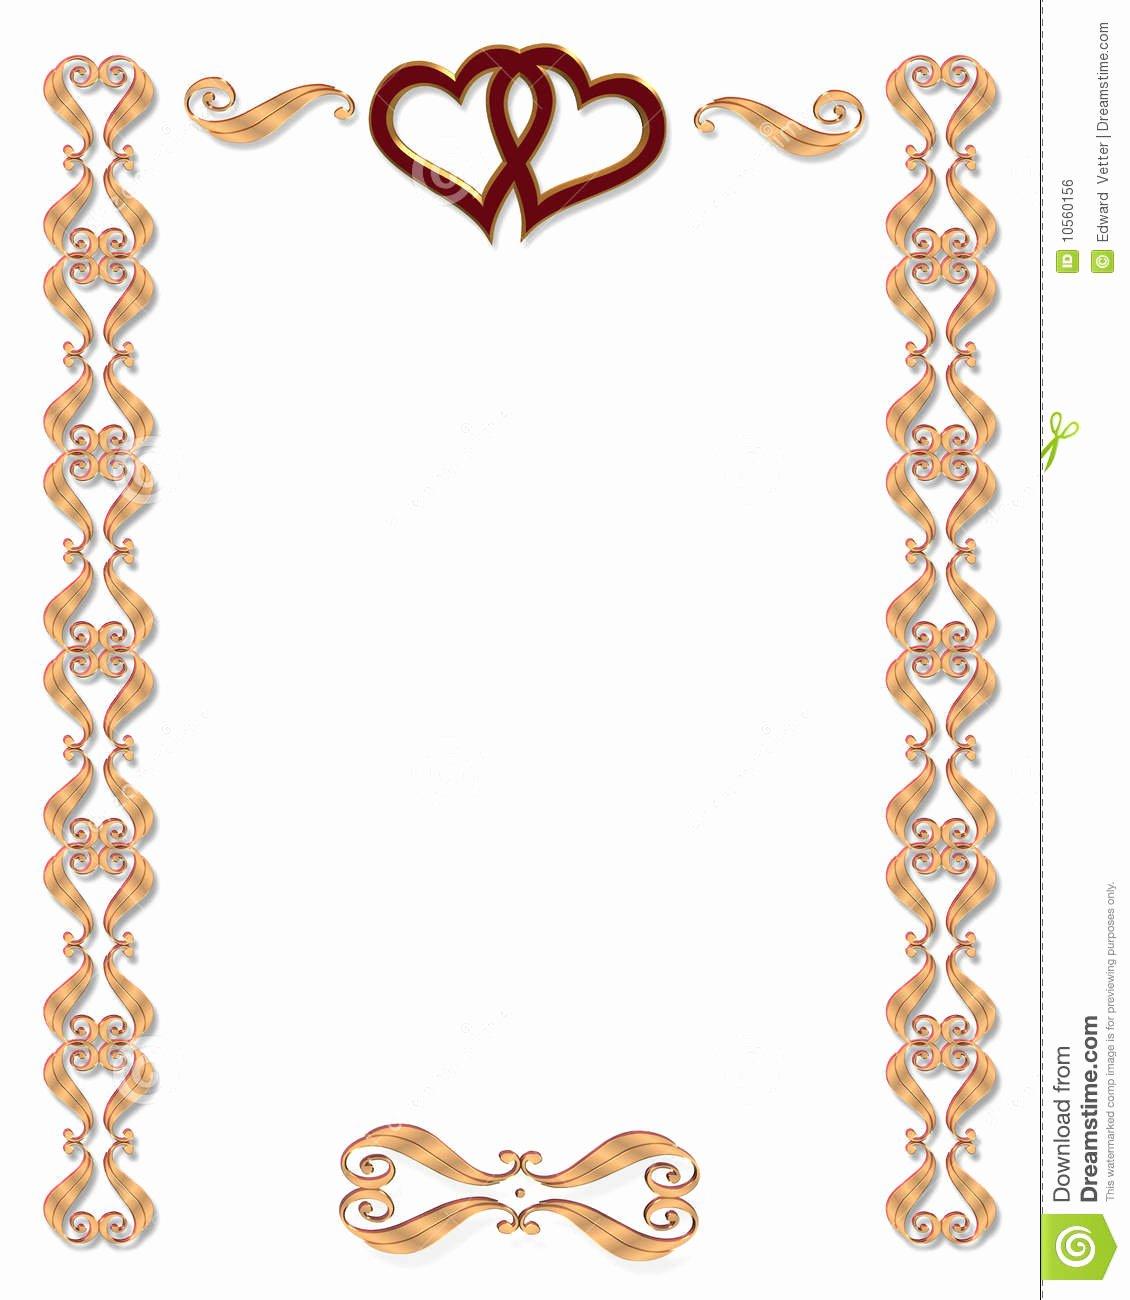 Free Gold Border Templates Luxury Wedding Invitation Border Gold Stock Illustration